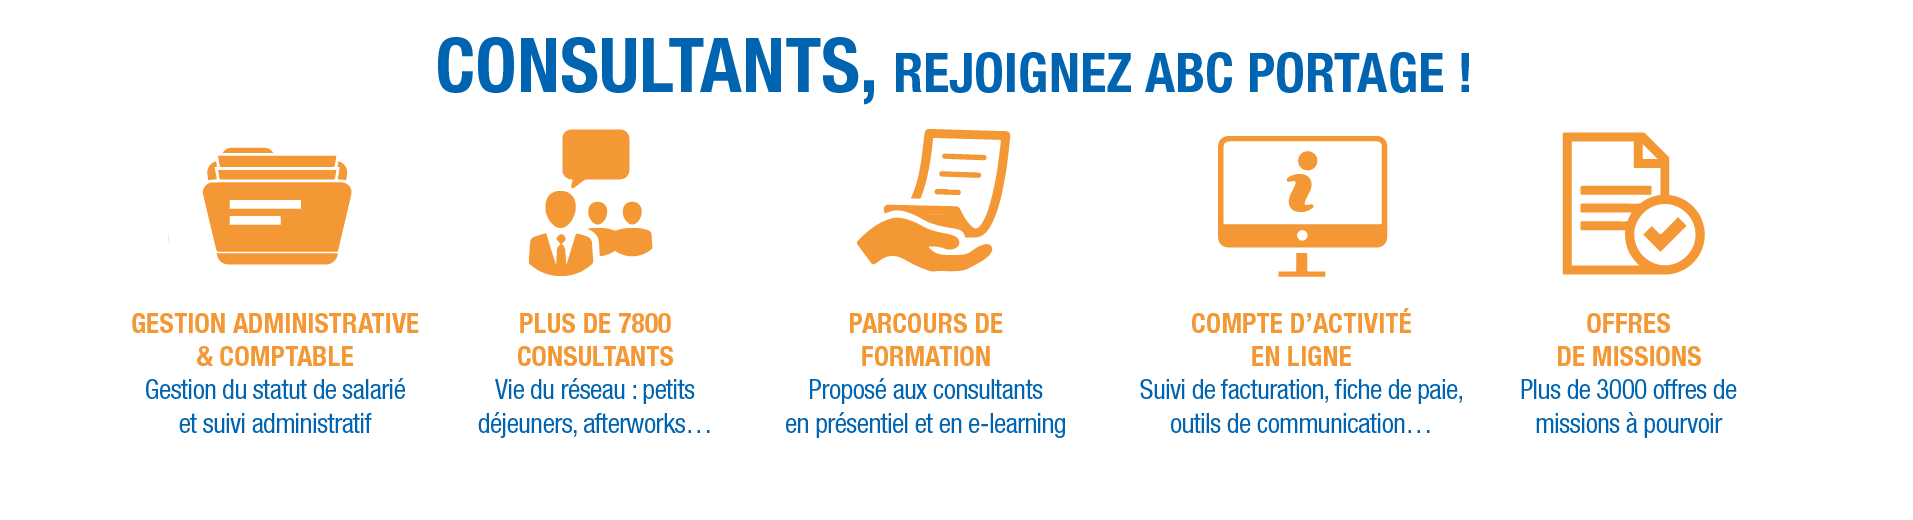 Consultants et portage salarial